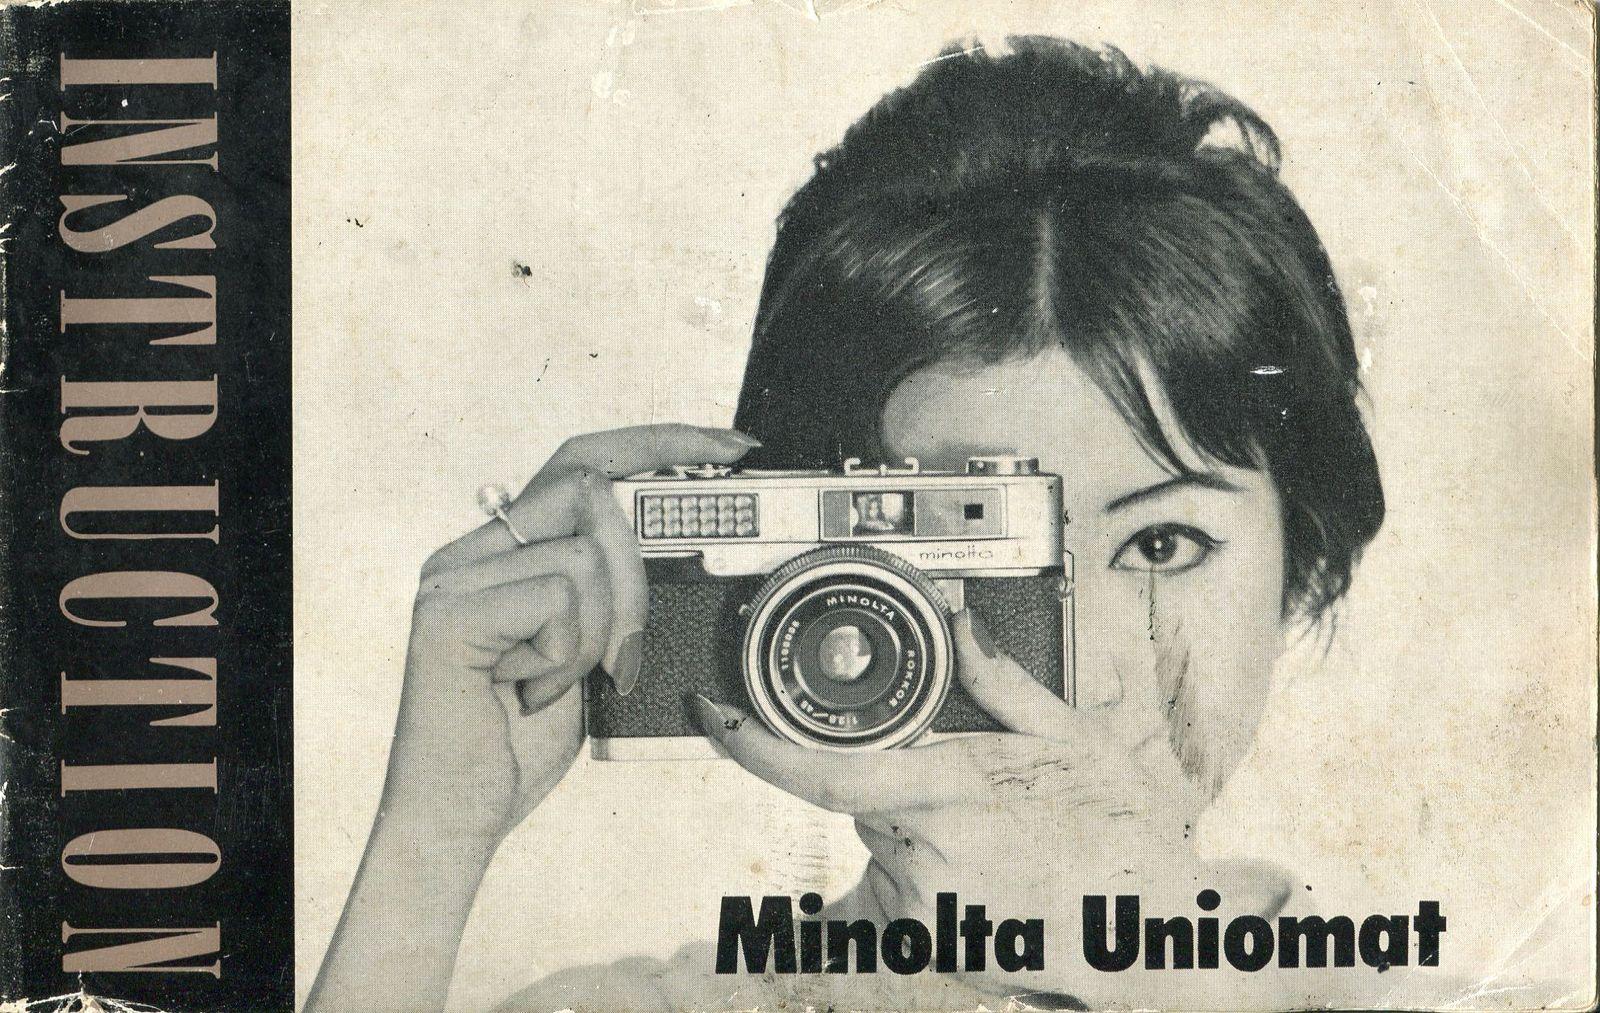 minolta uniomat manual rh cjs classic cameras co uk minolta camera manual 35mm minolta 7000 camera manual